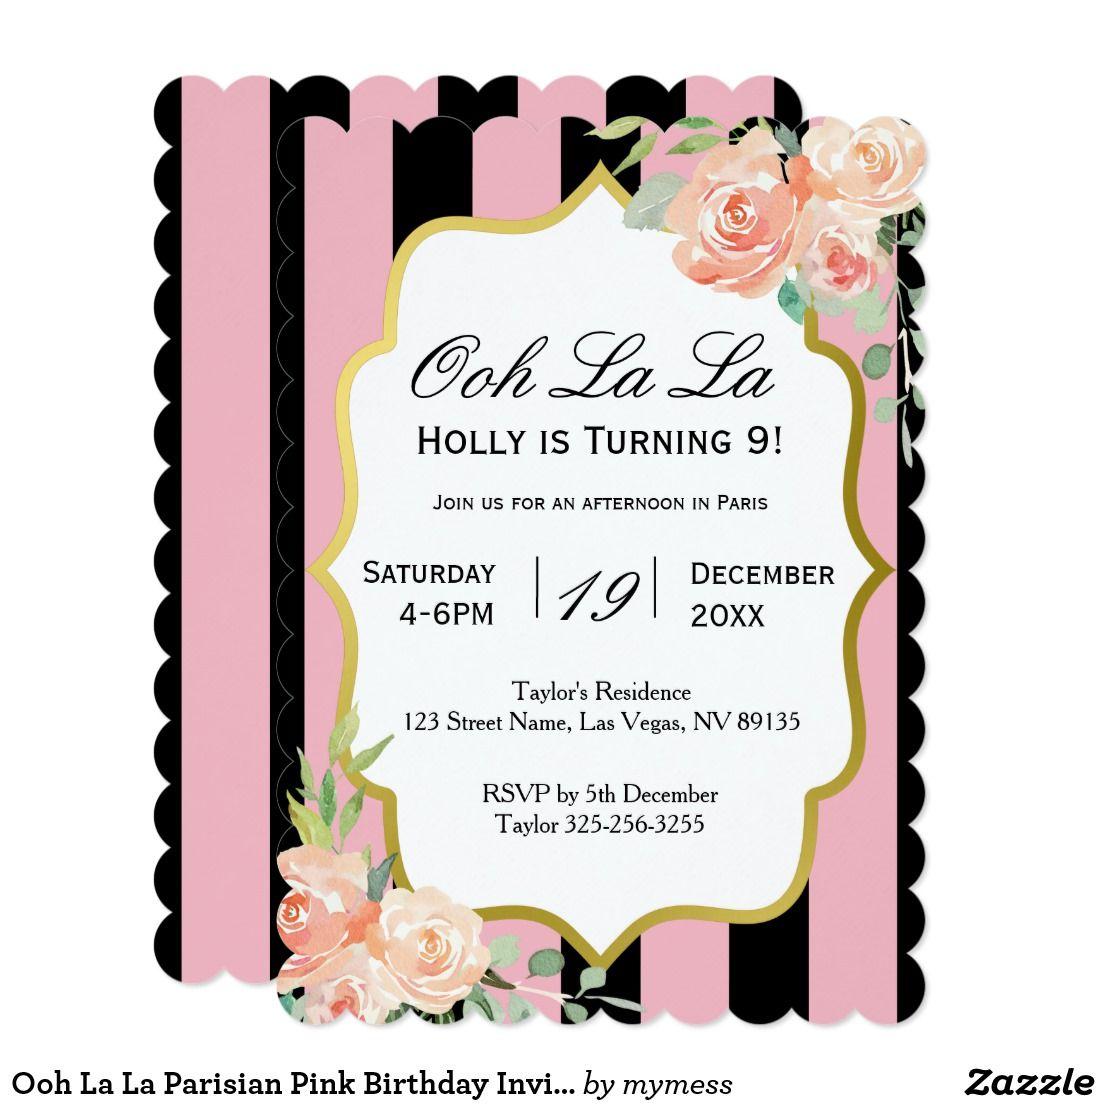 Ooh La La Parisian Pink Birthday Invitation | Birthday bash and ...